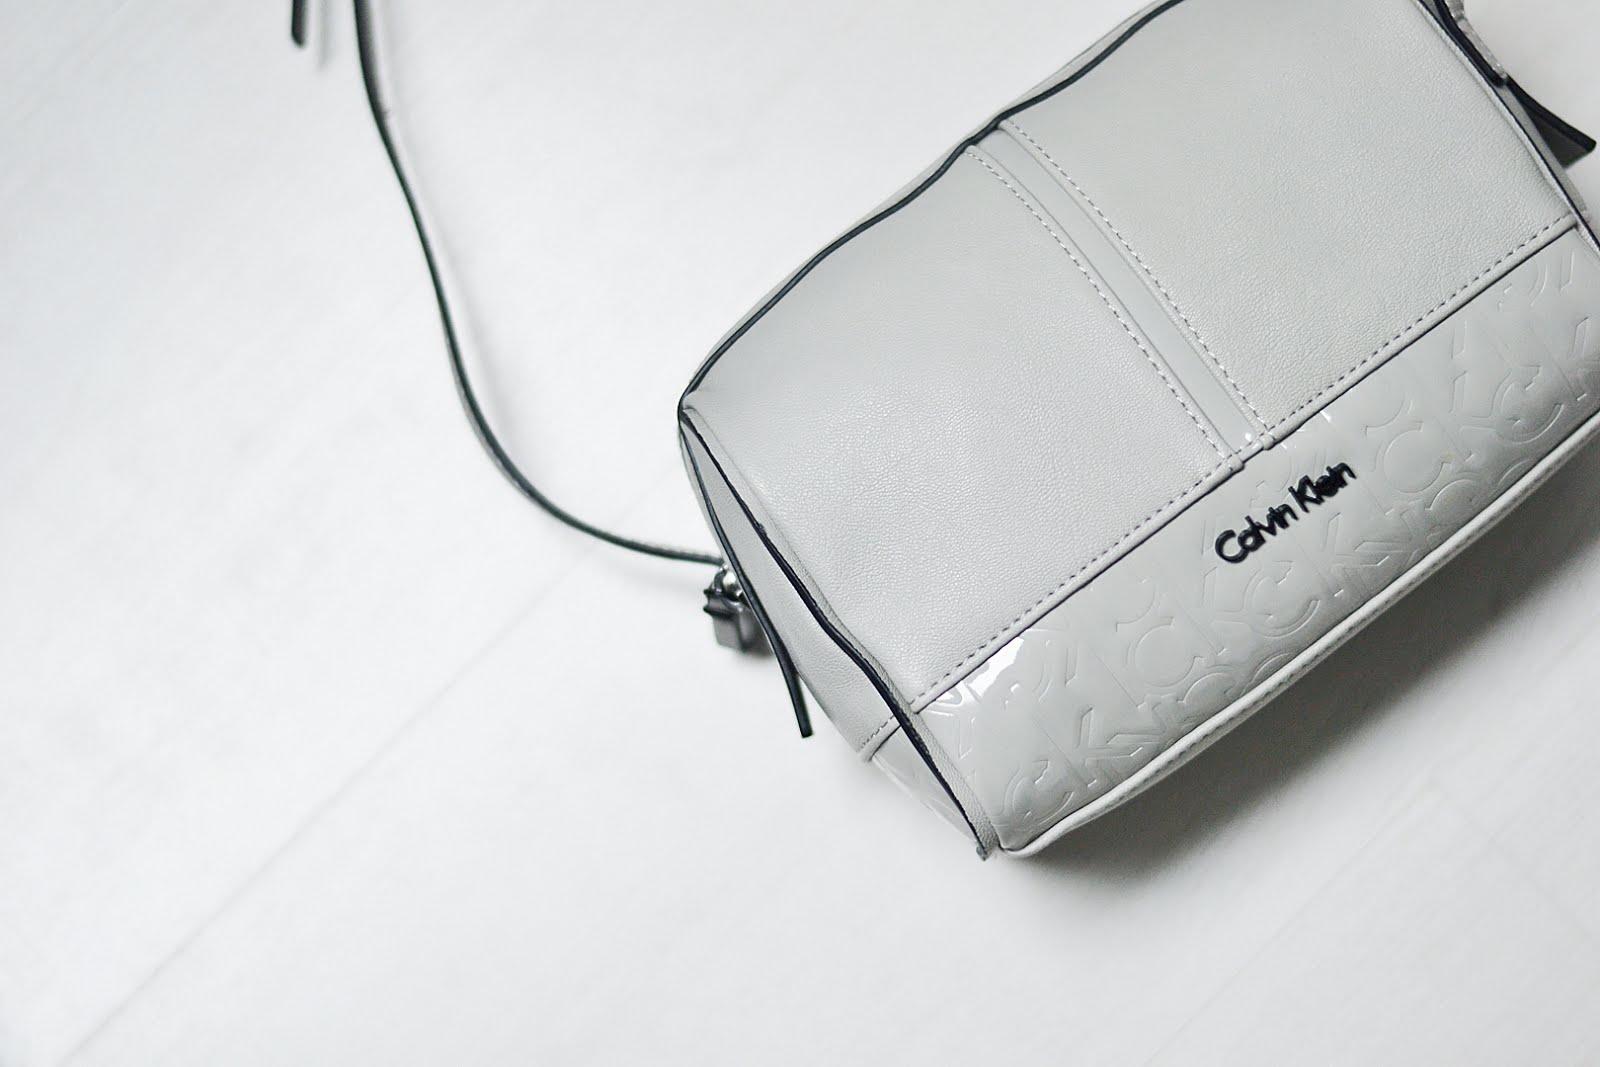 Calvin Klein bag, small, grey, basic, minimalistic, maasmechelen village, sjiek shopping days, belgian blogger